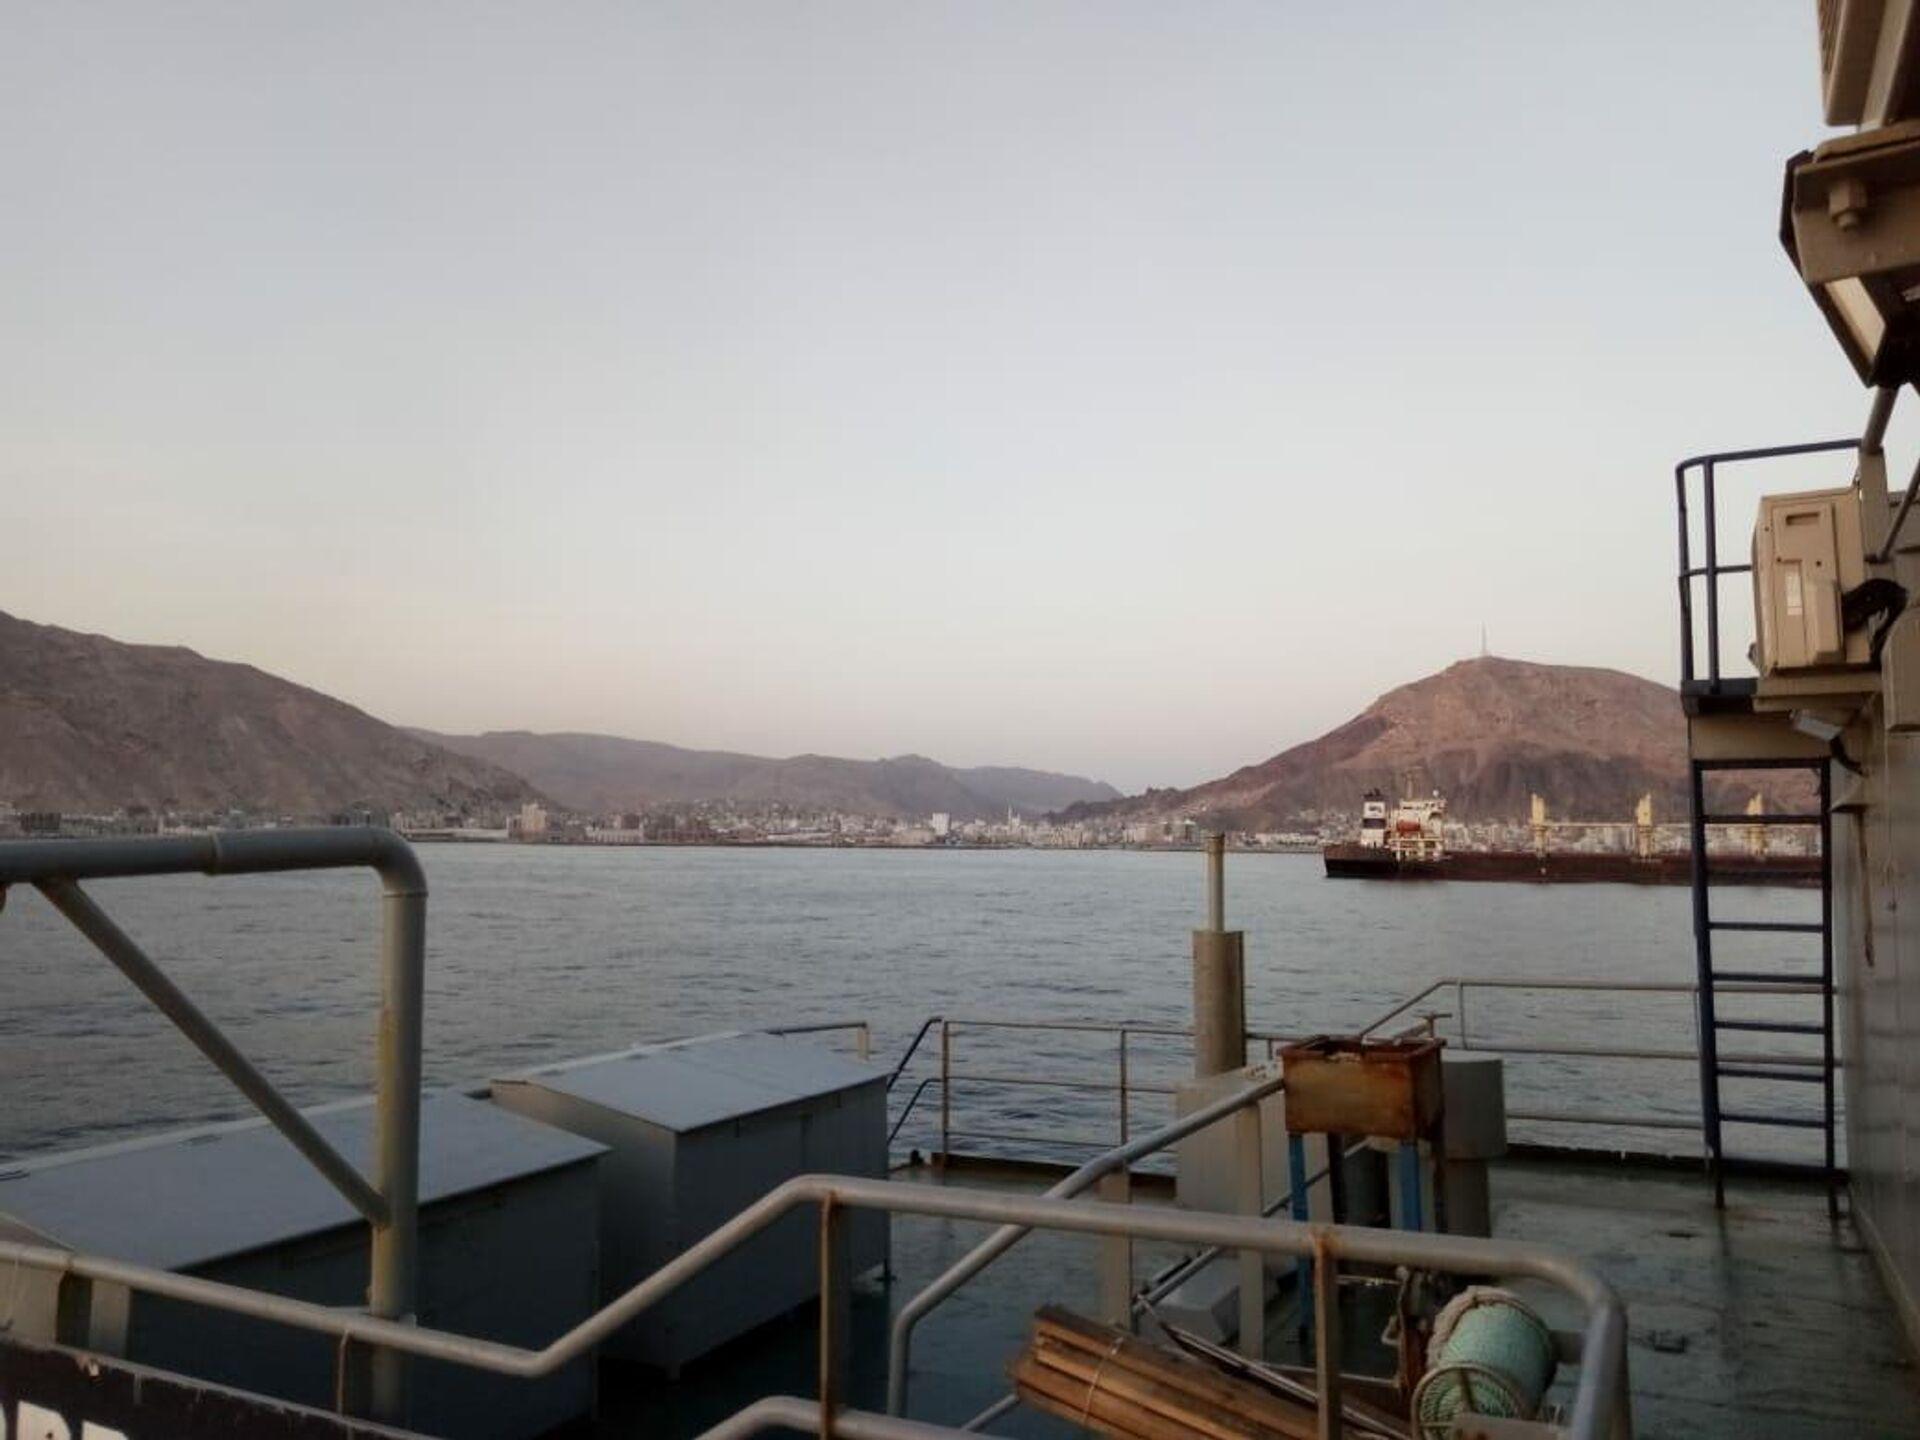 Vista de Al Mukalla (Yemen) desde el buque pesquero 'Cobija'  - Sputnik Mundo, 1920, 02.08.2021